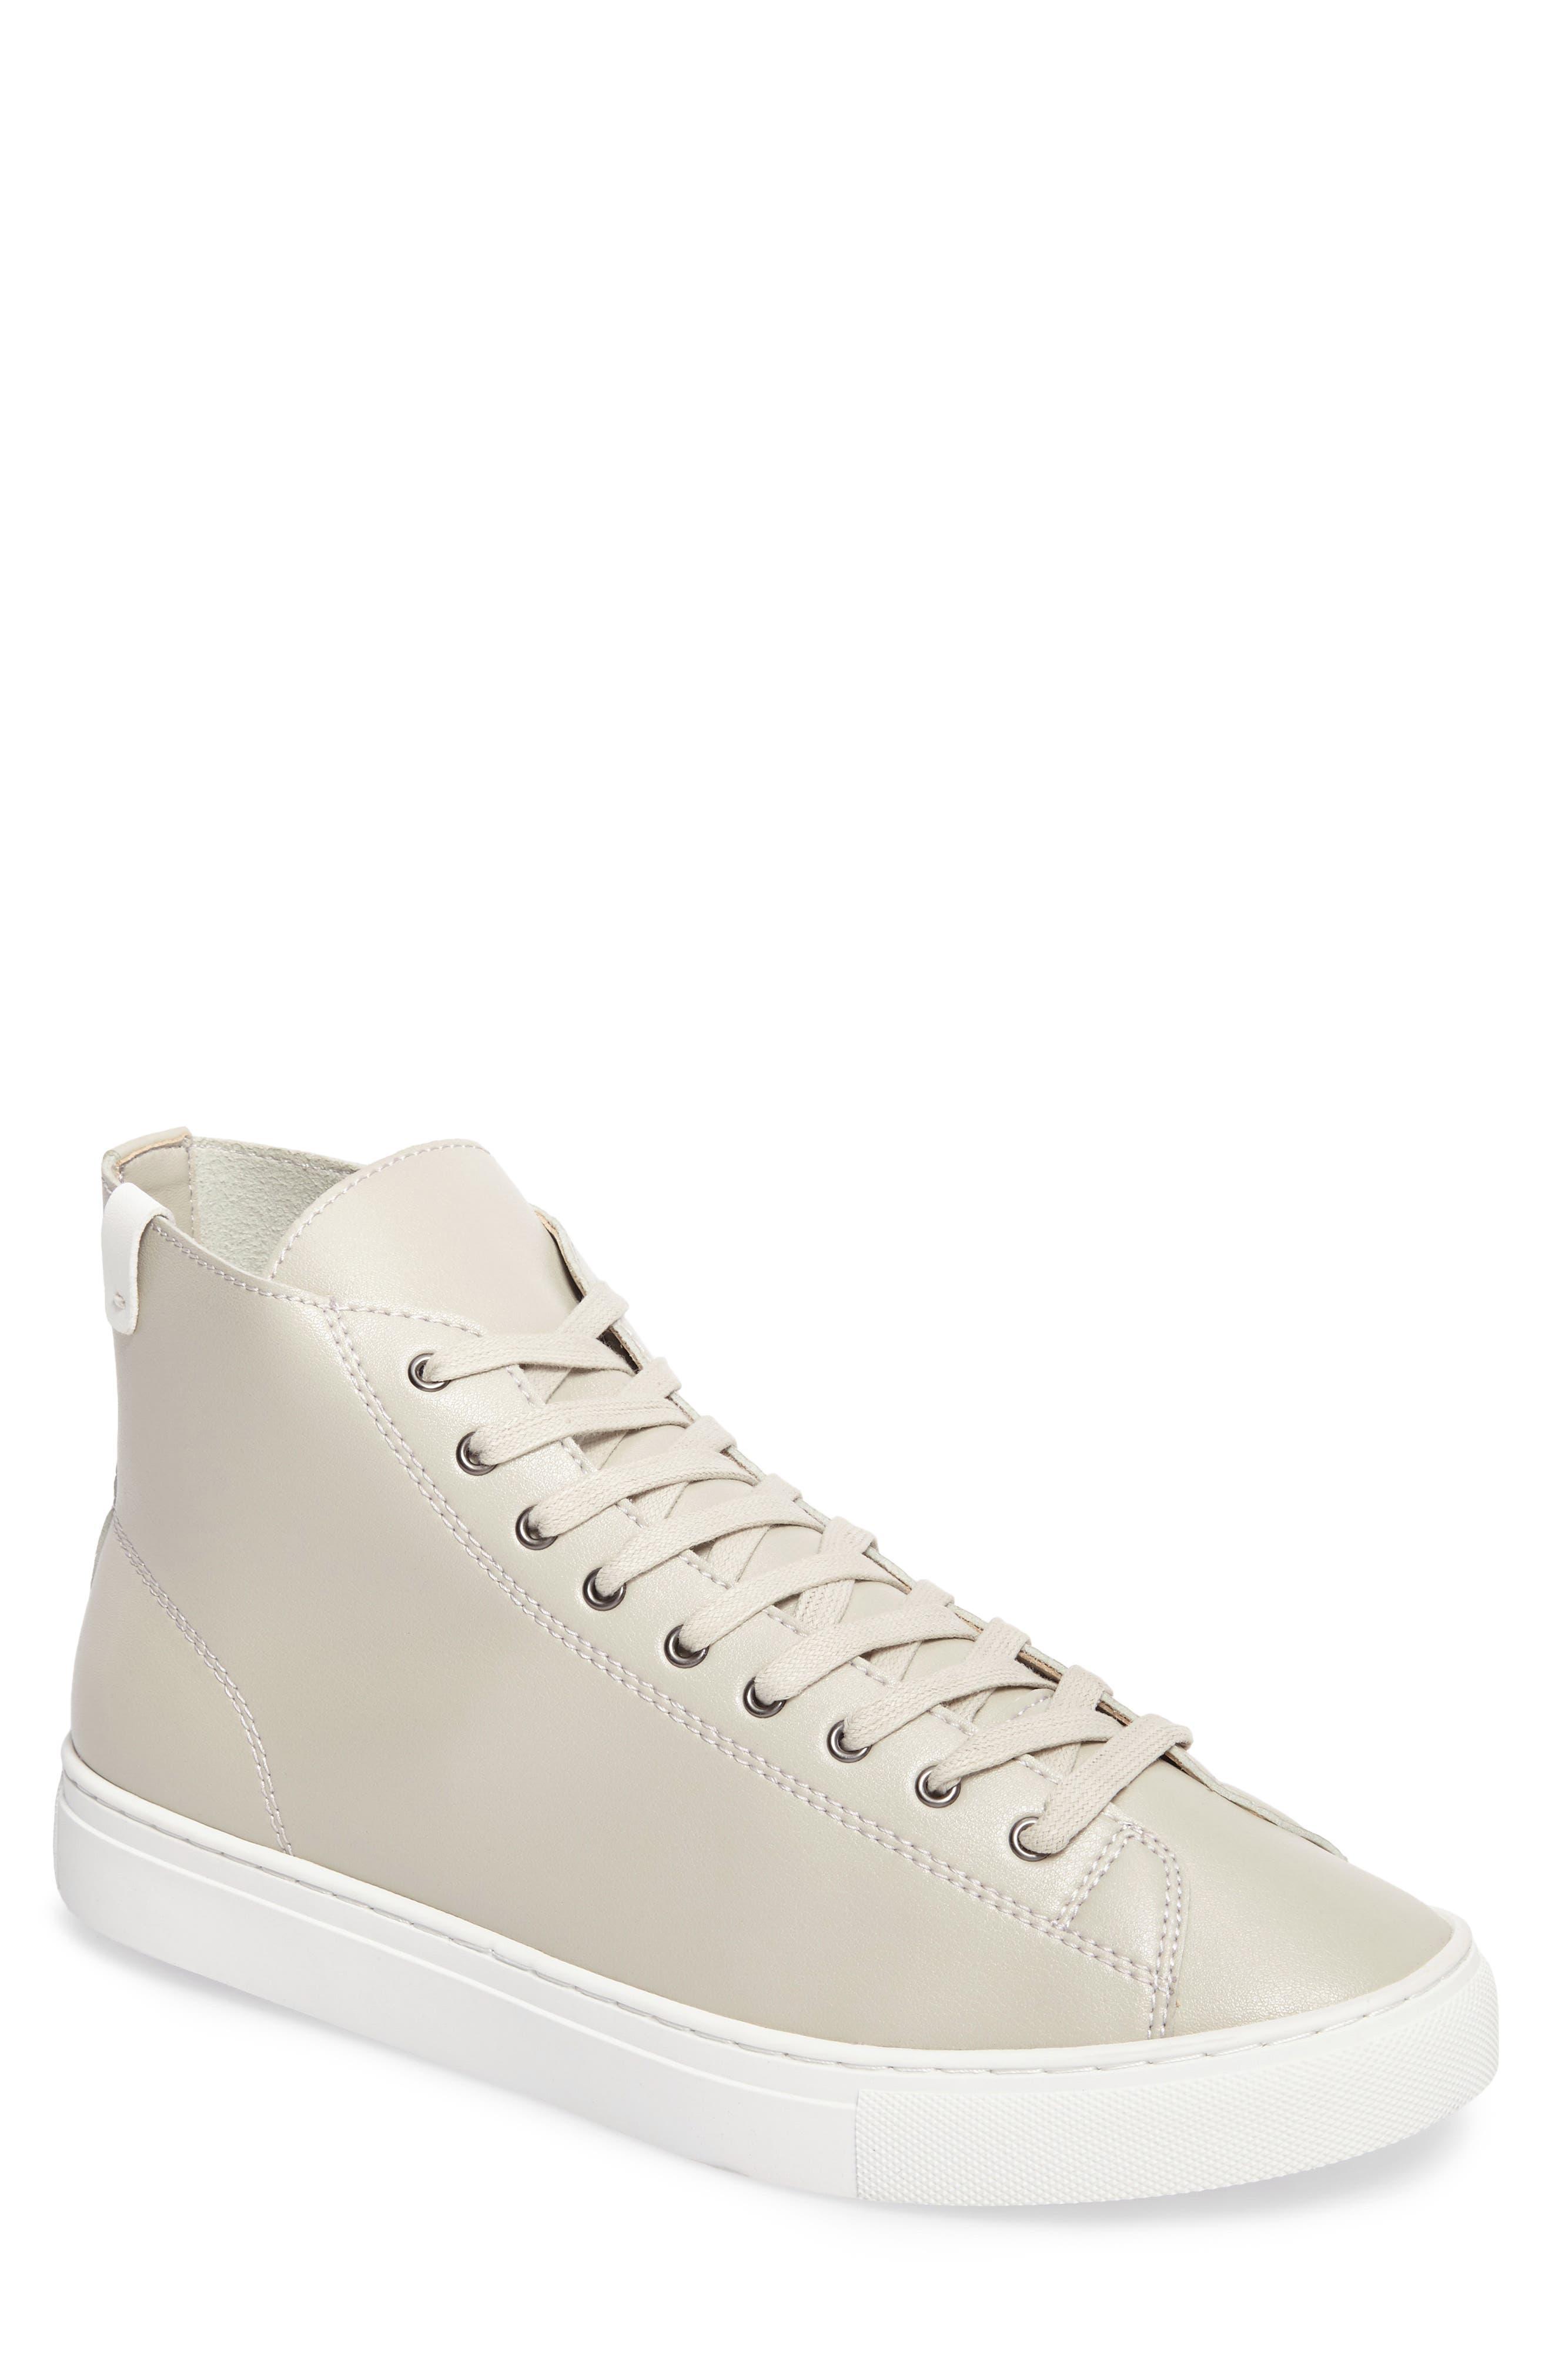 House of Future Original High Top Sneaker (Men)